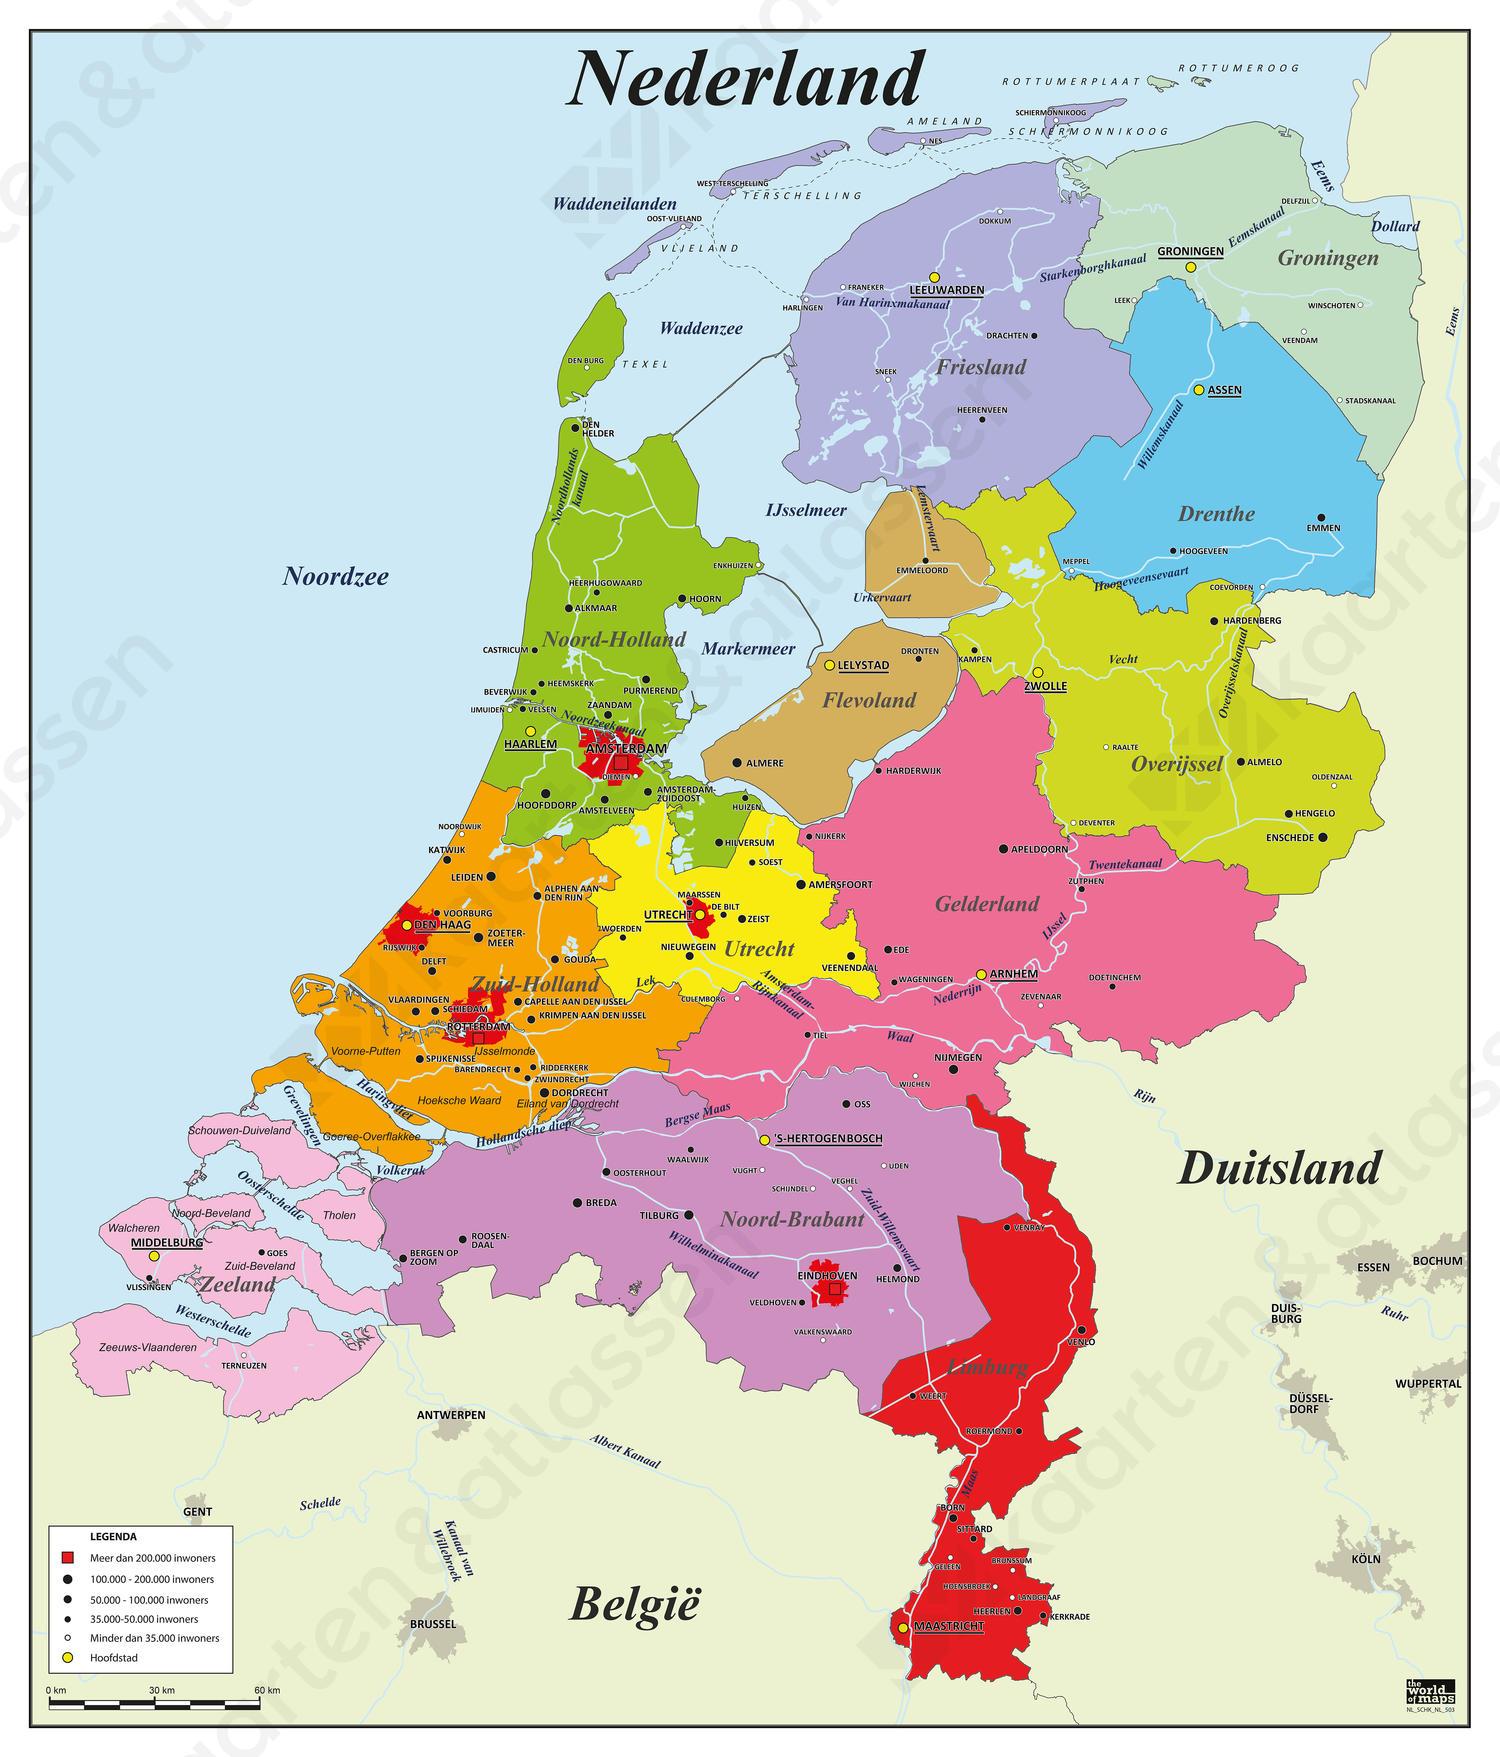 NL_SCHOOL_NL_503_Complete_2014_6000PIX.jpg